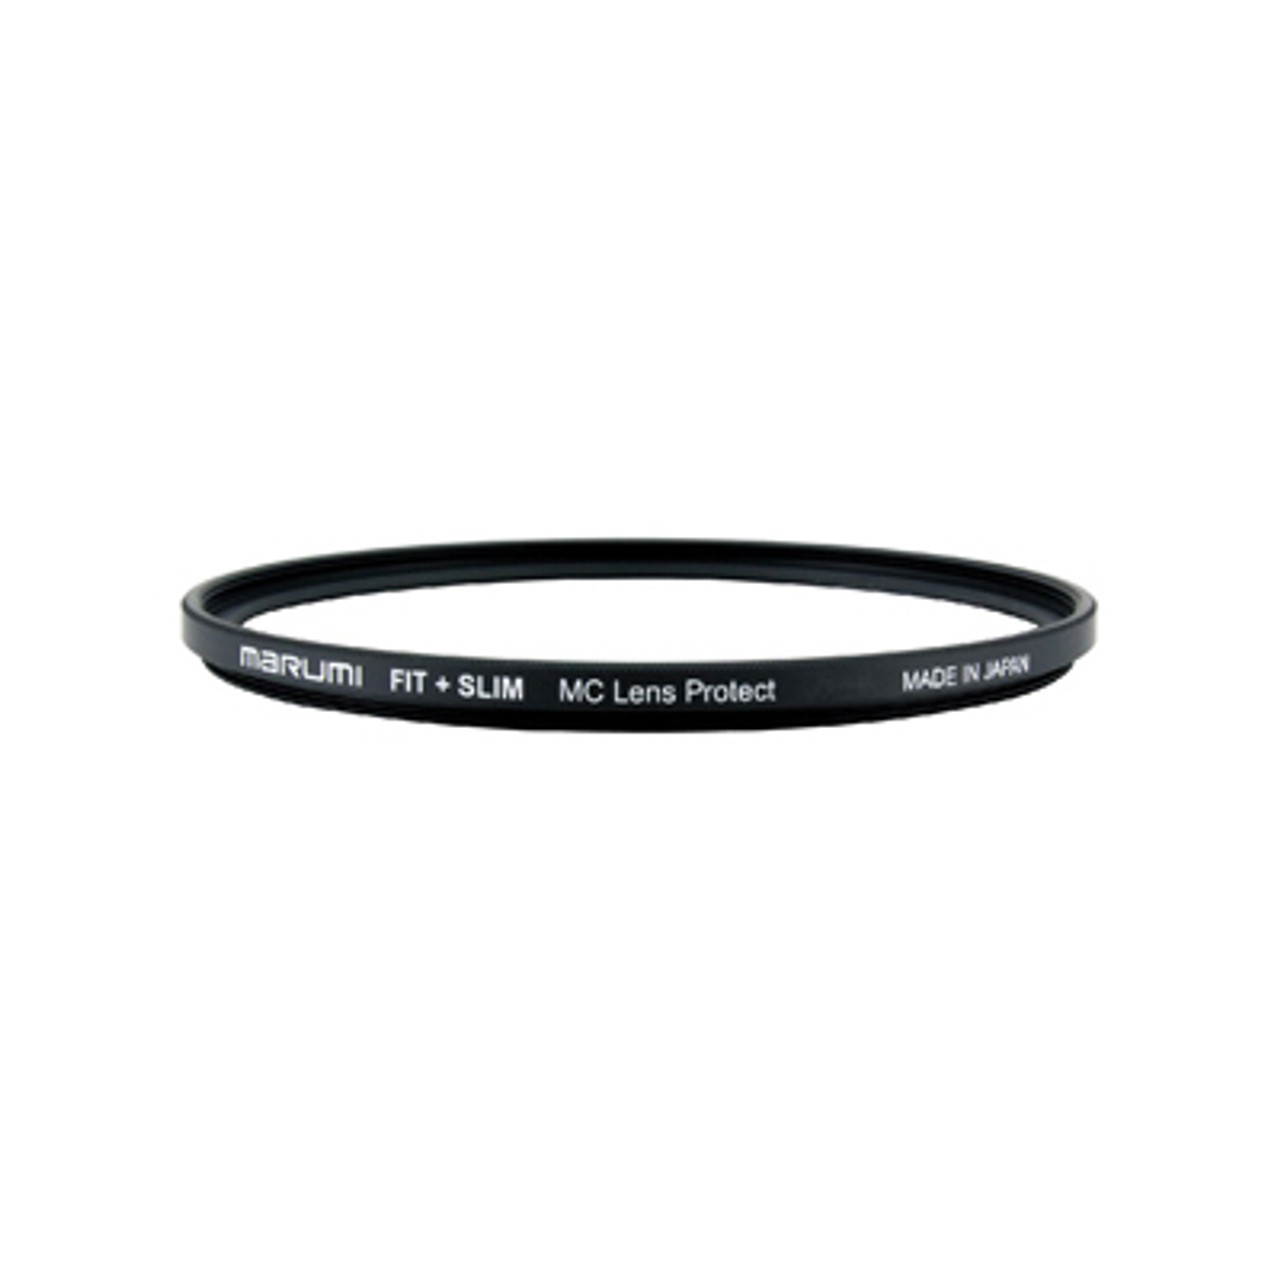 Marumi 67mm Lens Protect Filter